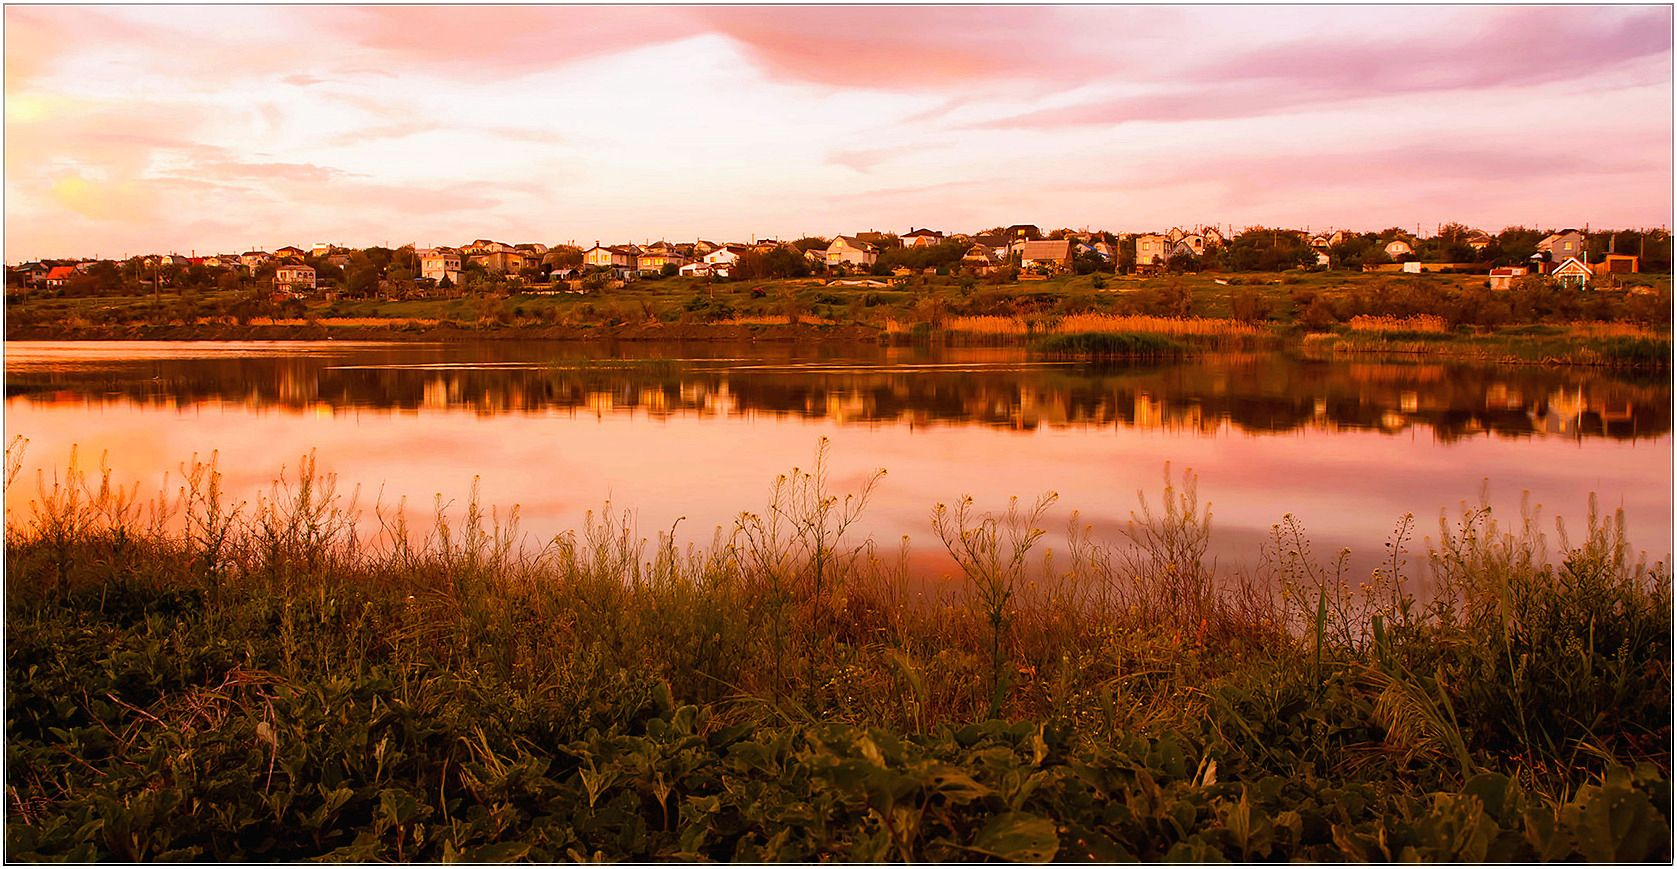 Теплый майский вечер у пруда. Берег трава пруд дачный поселок небо